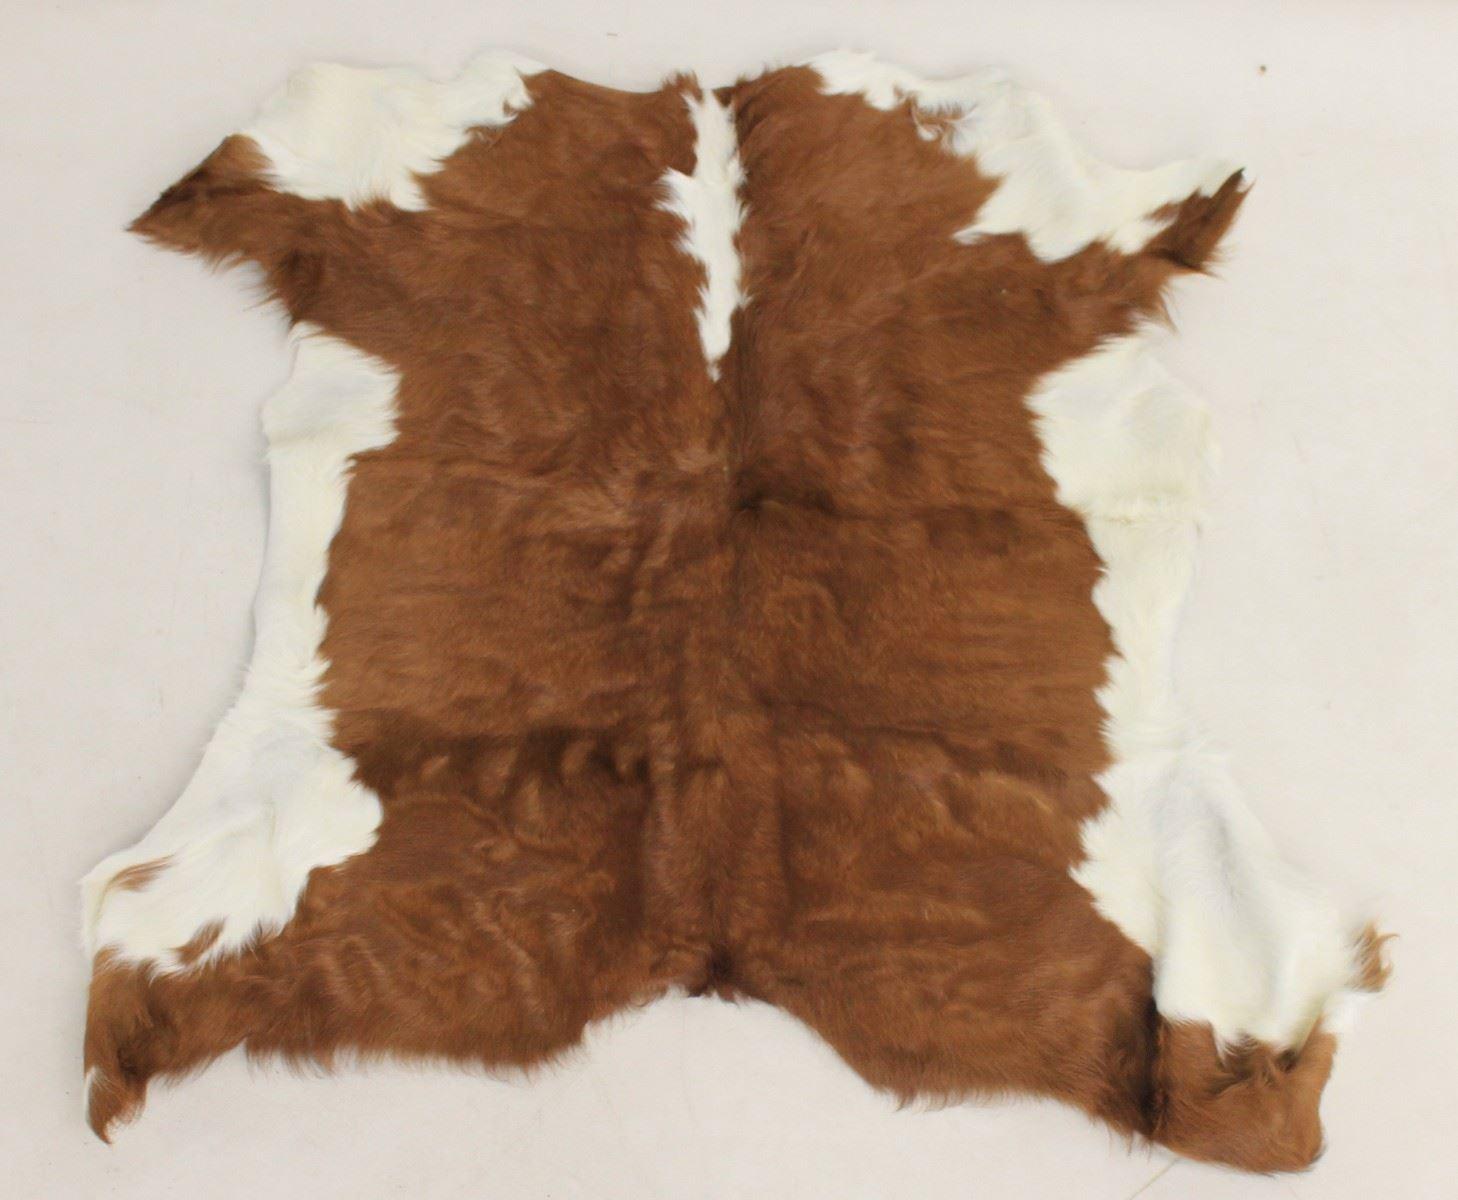 Calfskin Rug Cowhide Cow Hide Skin Leather Calf Calfhide